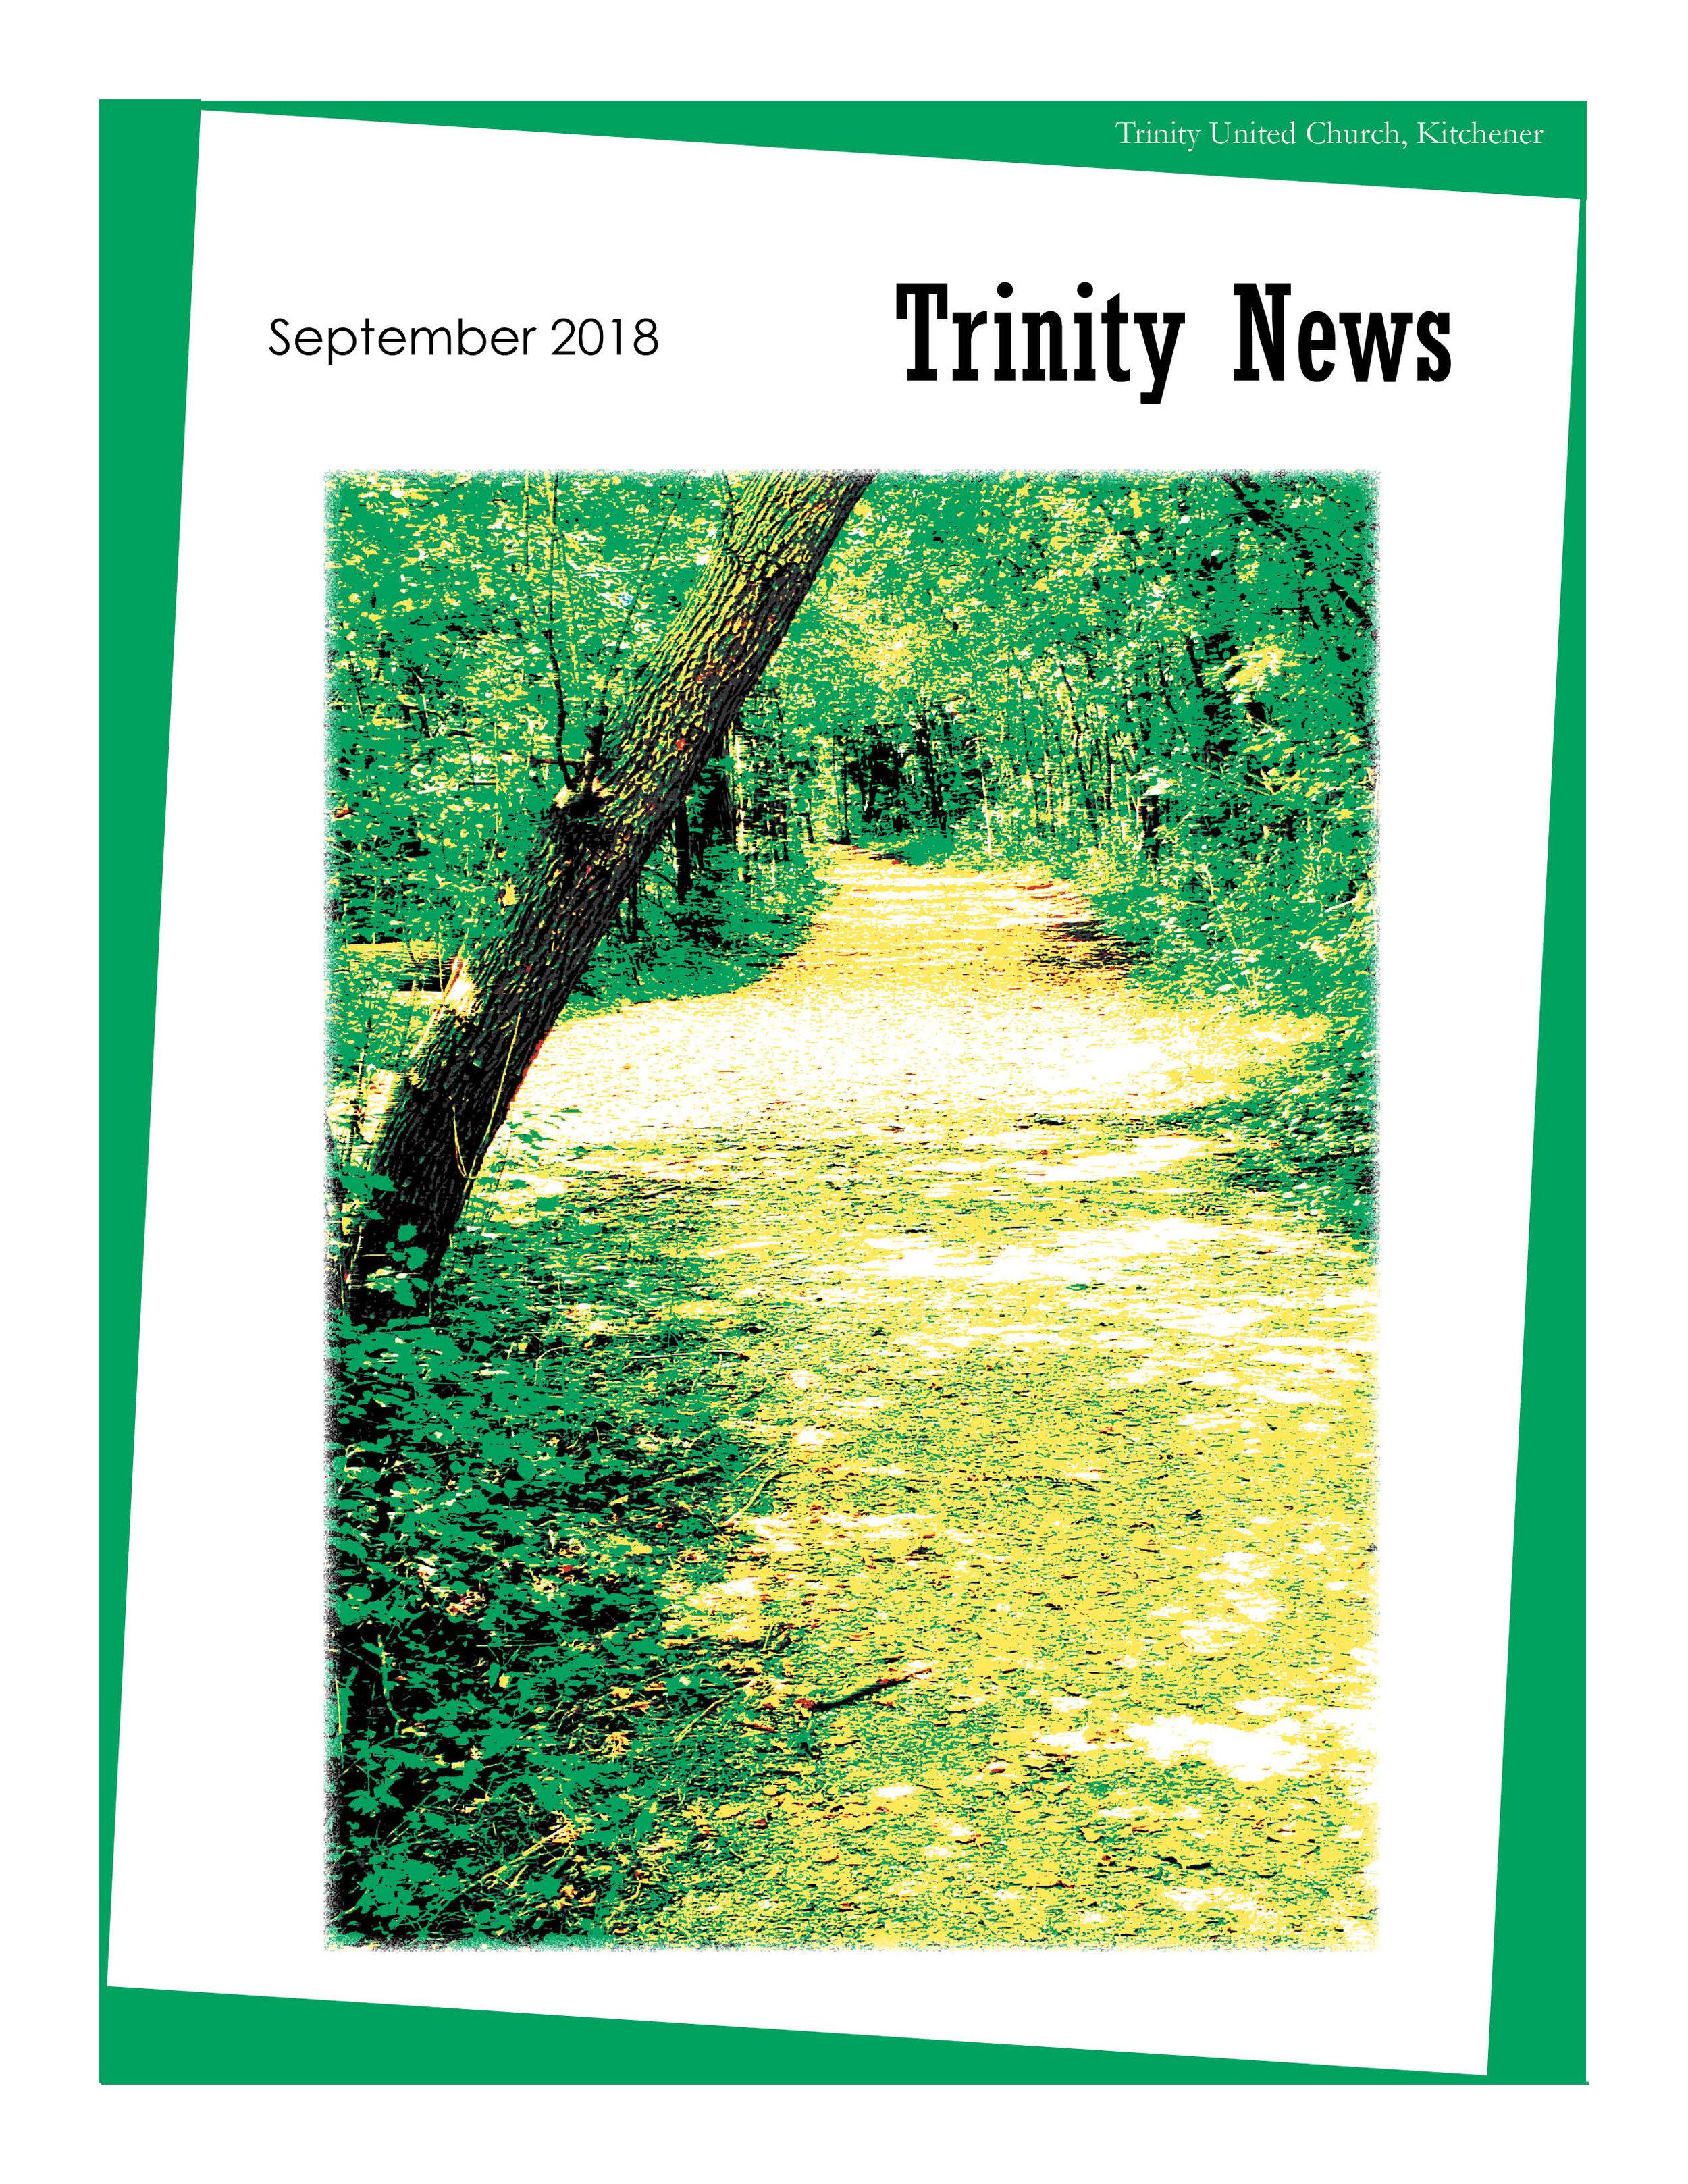 Trinity News September 2018.jpg